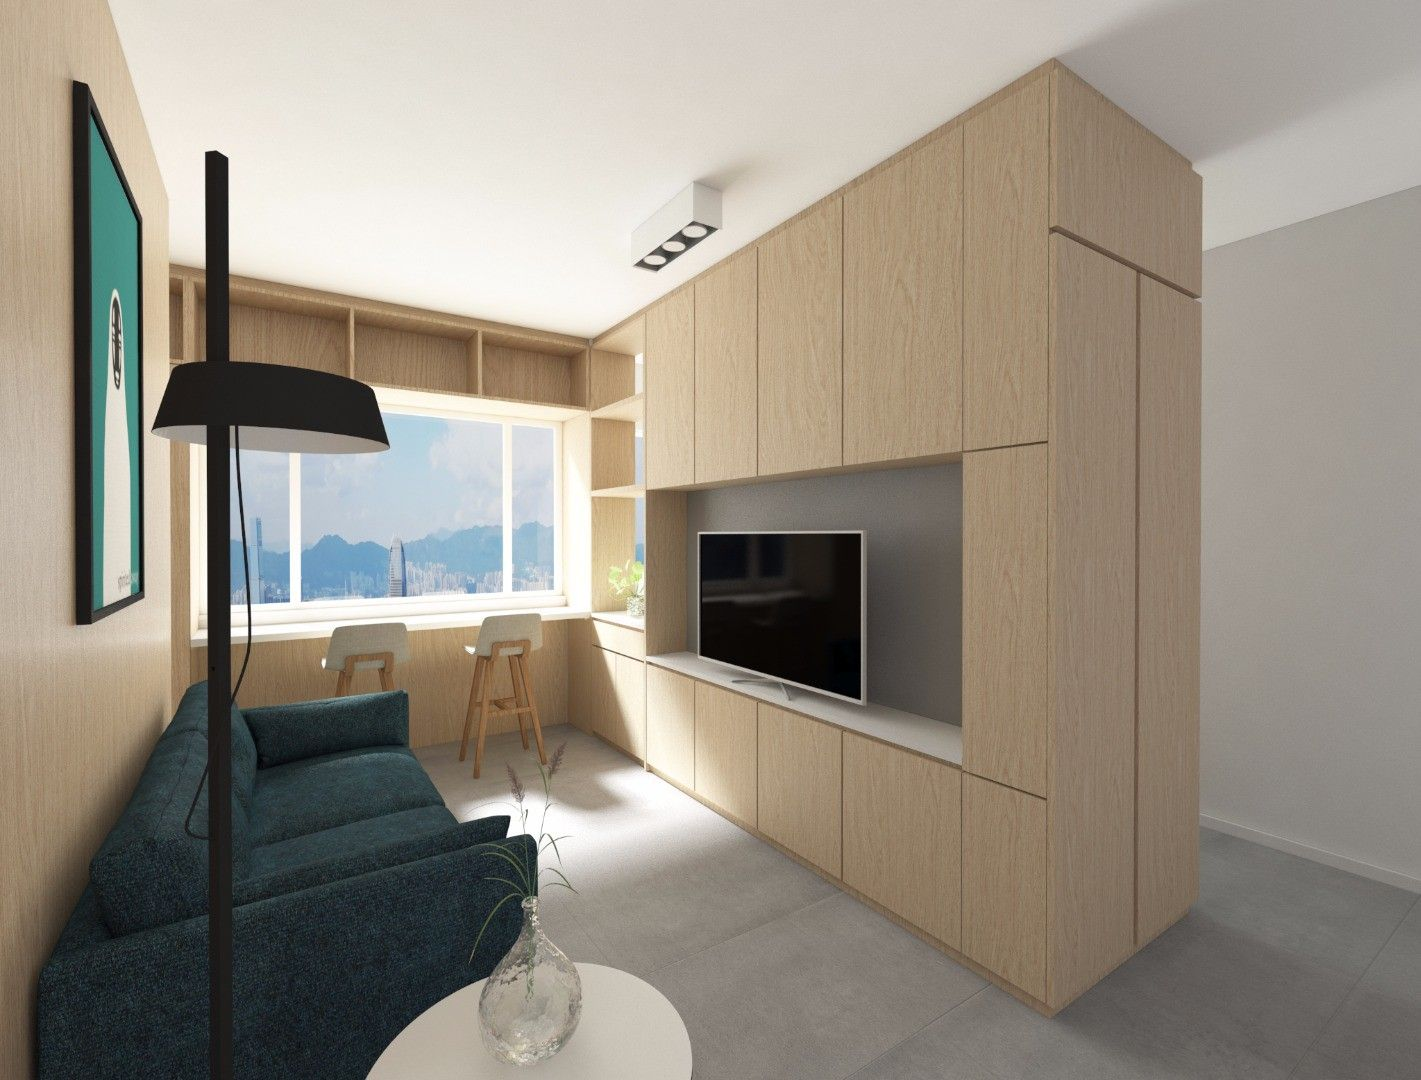 Diy small home decor residential interior design hong kong interior designer find the best freelance interior designers expertise in small space design